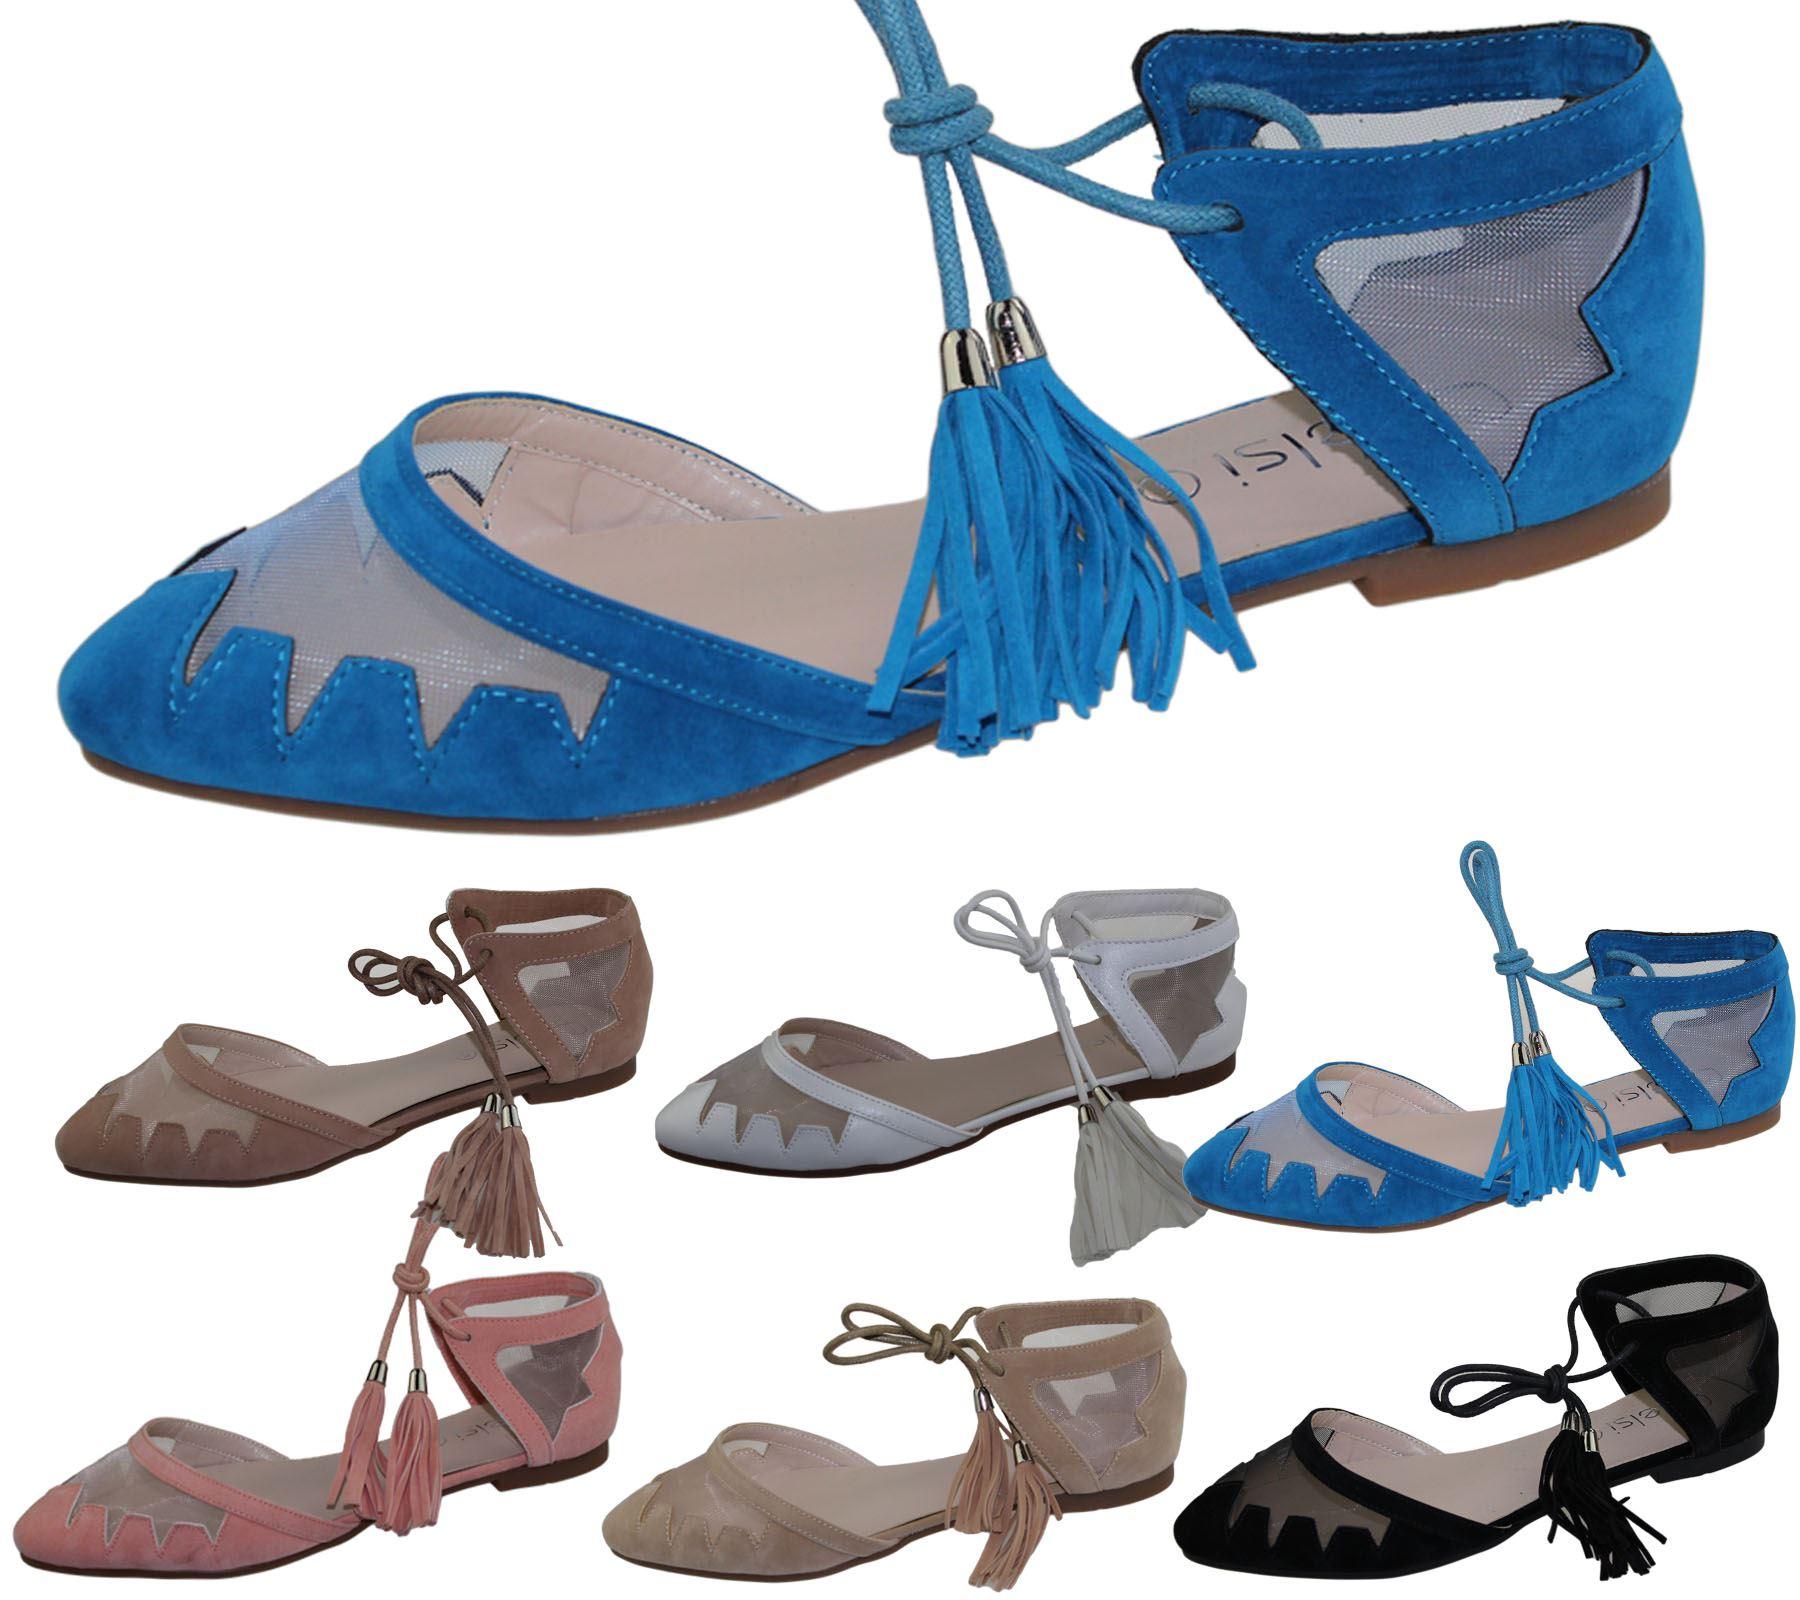 Womens-Flat-Ballerina-Dolly-Pumps-Ballet-Ladies-Summer-Mesh-Tassel-Shoes-Sandals thumbnail 15